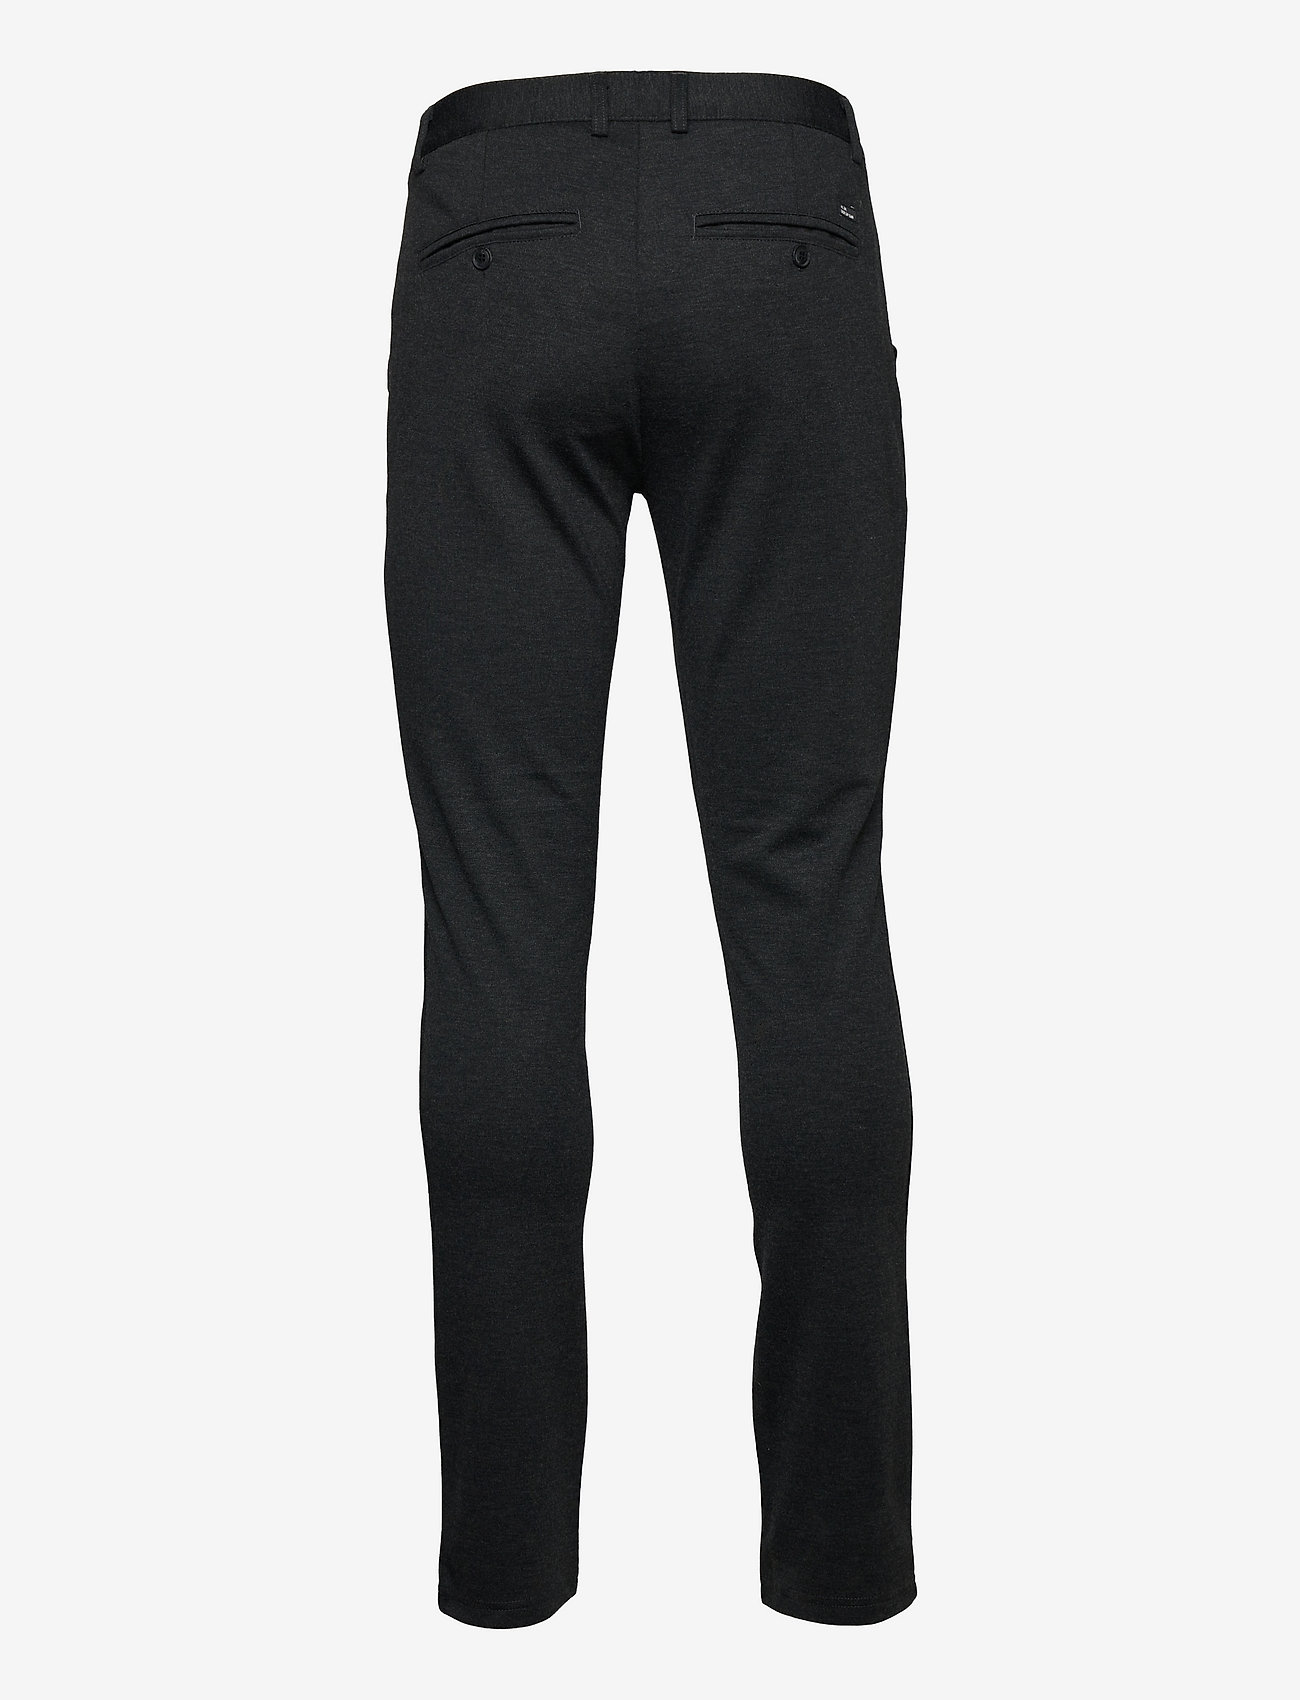 Blend - Pants - od garnituru - charcoal - 1